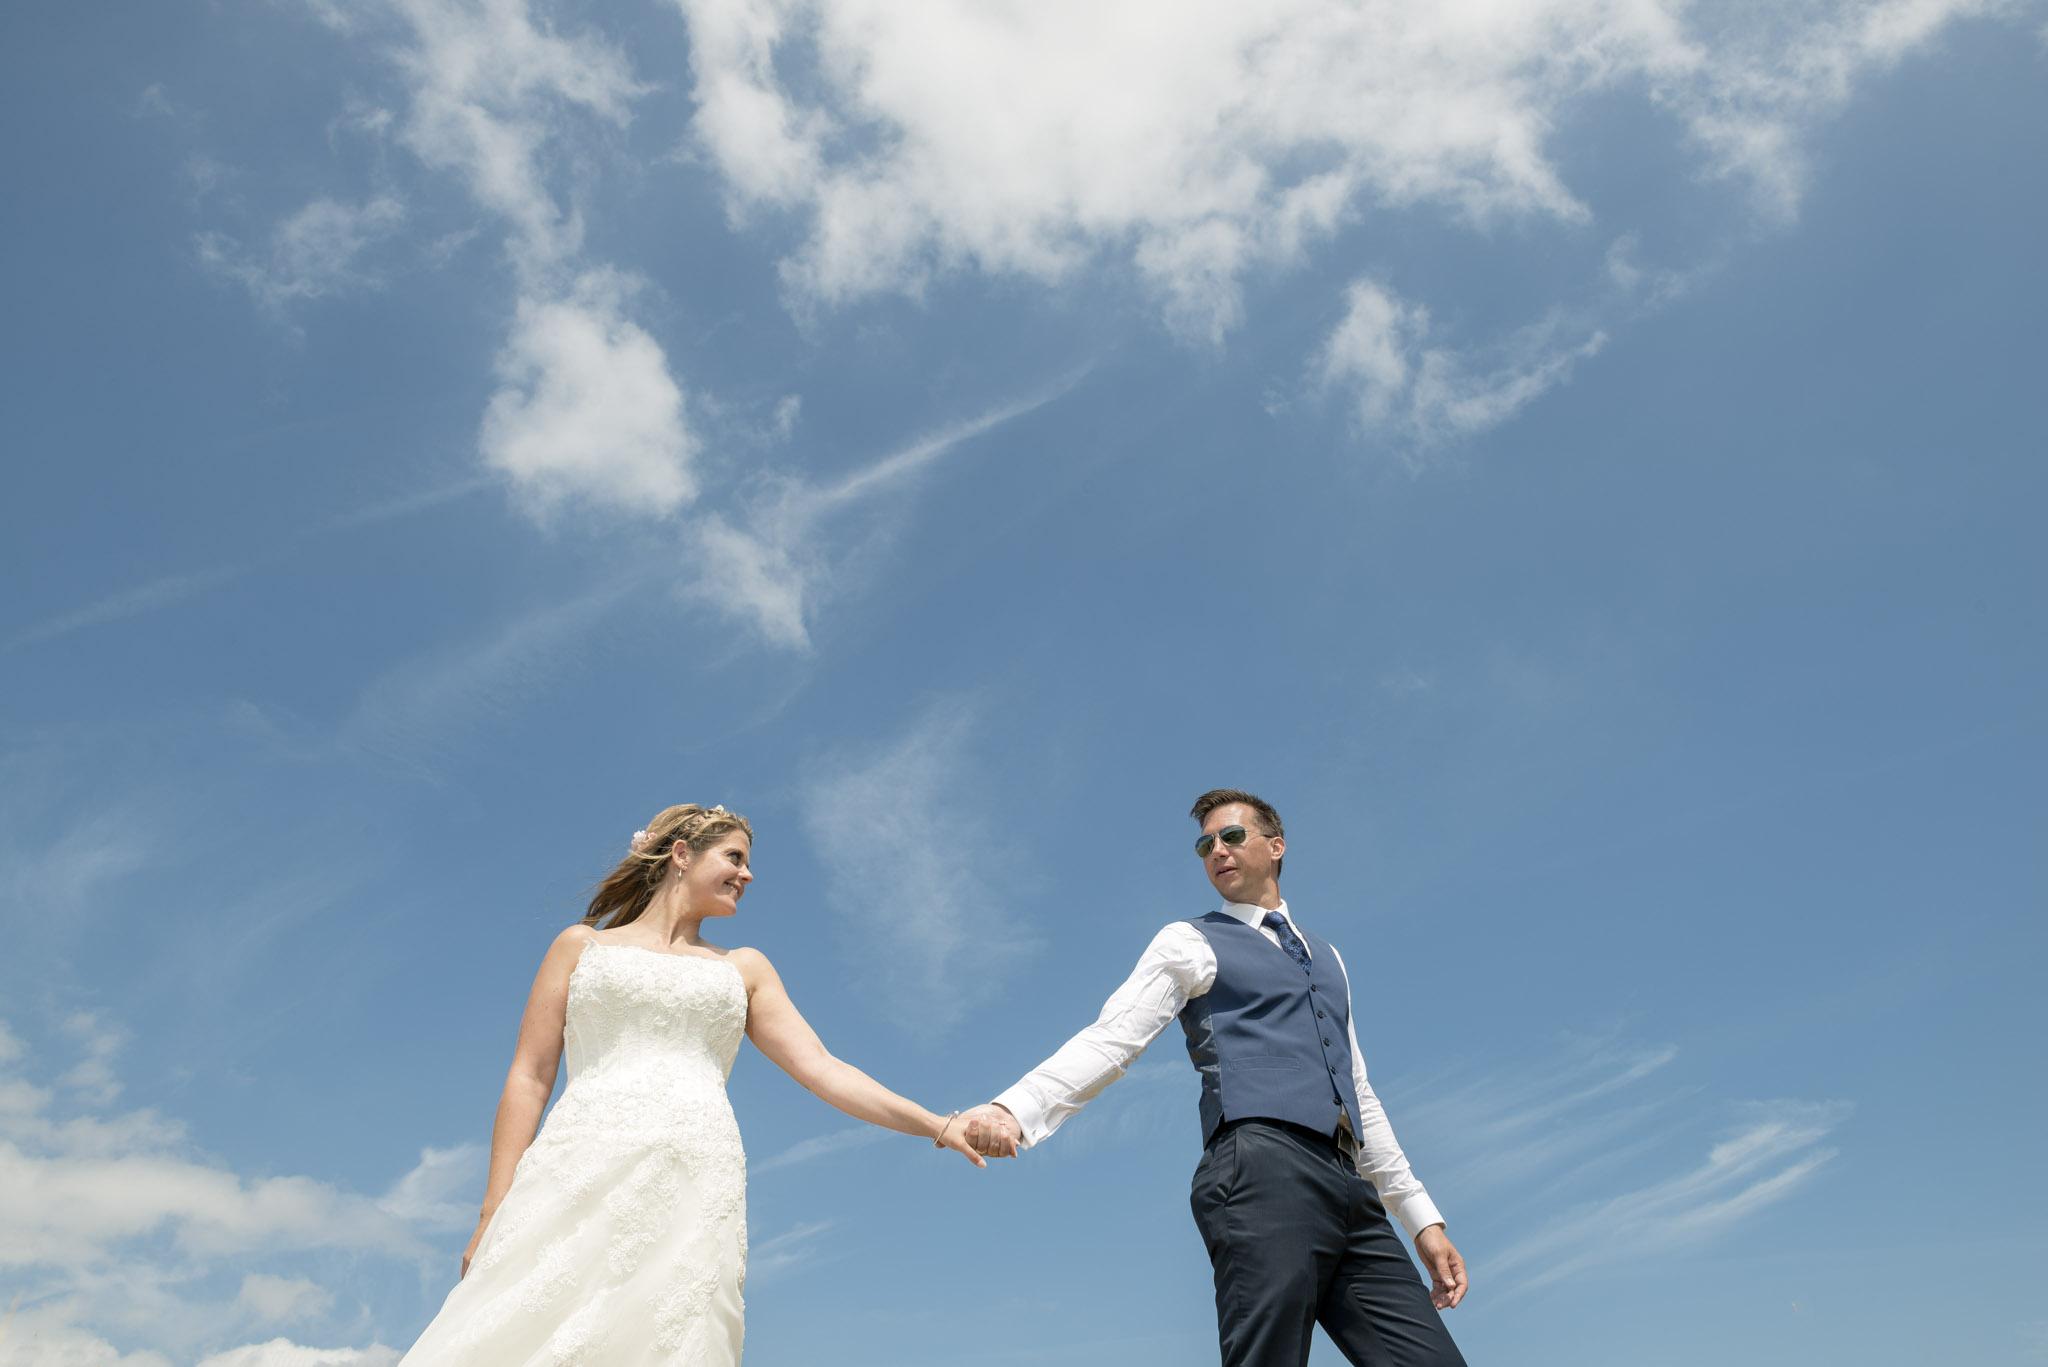 web_brighton_cool_wedding-3.jpg